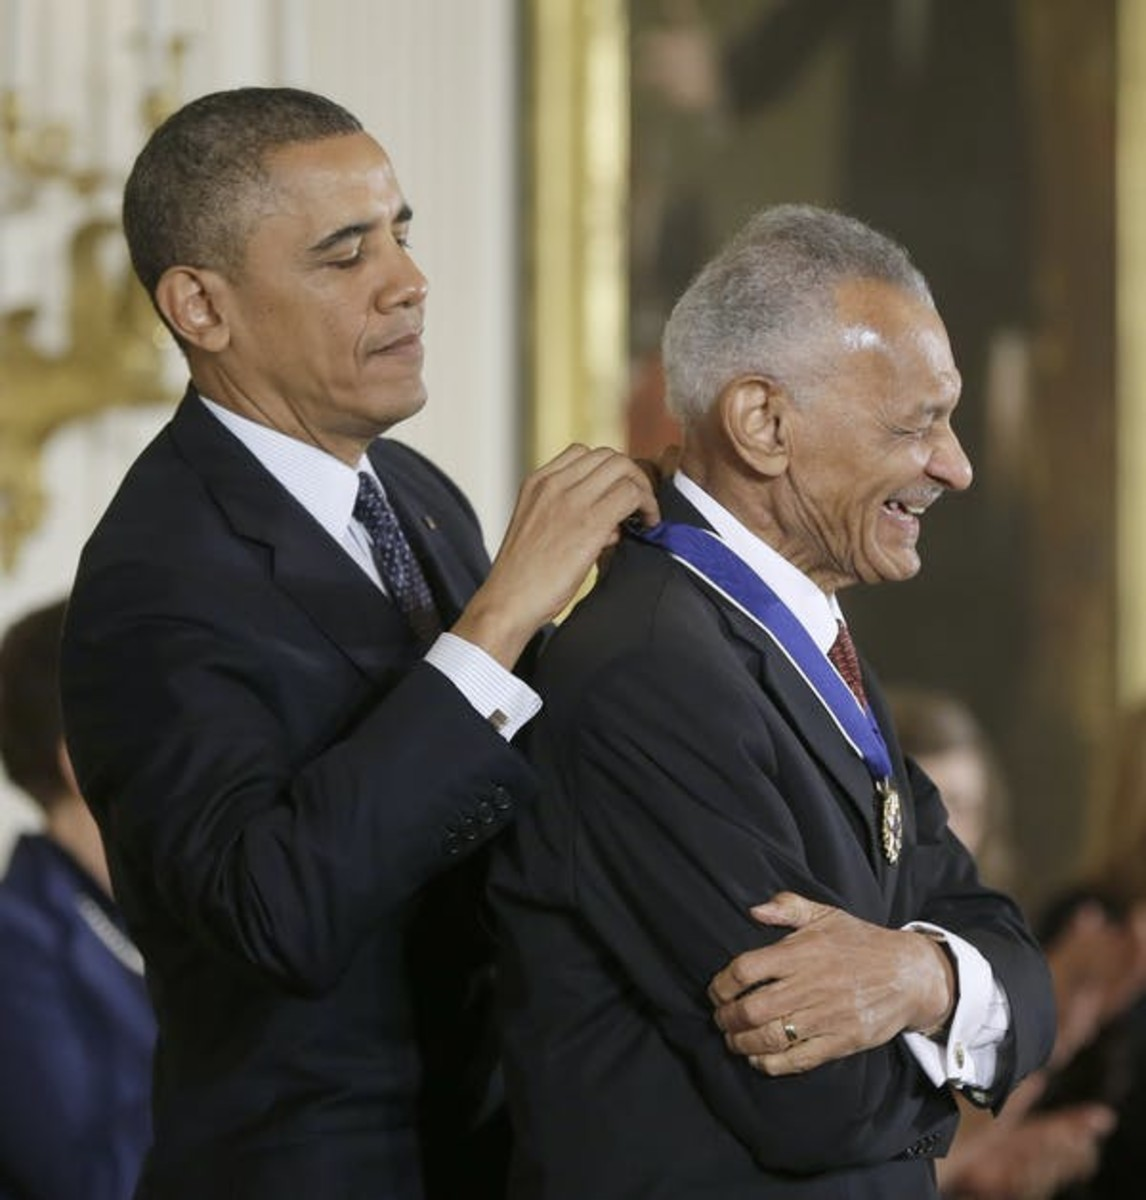 President Obama awarded Rev. C.T. Vivian the Presidential Medal of Freedom in 2013. AP Photo/Pablo Martinez Monsivais